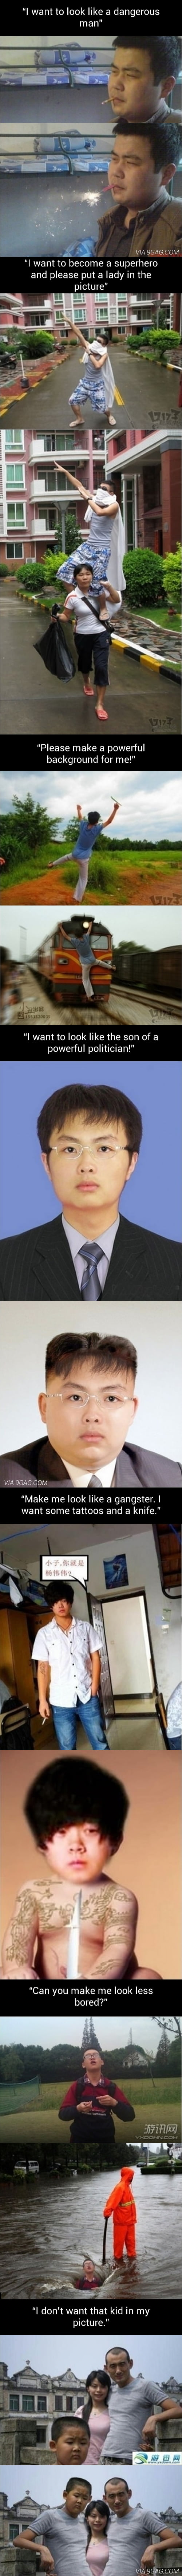 Asian Photoshop App Asian Photoshop Troll